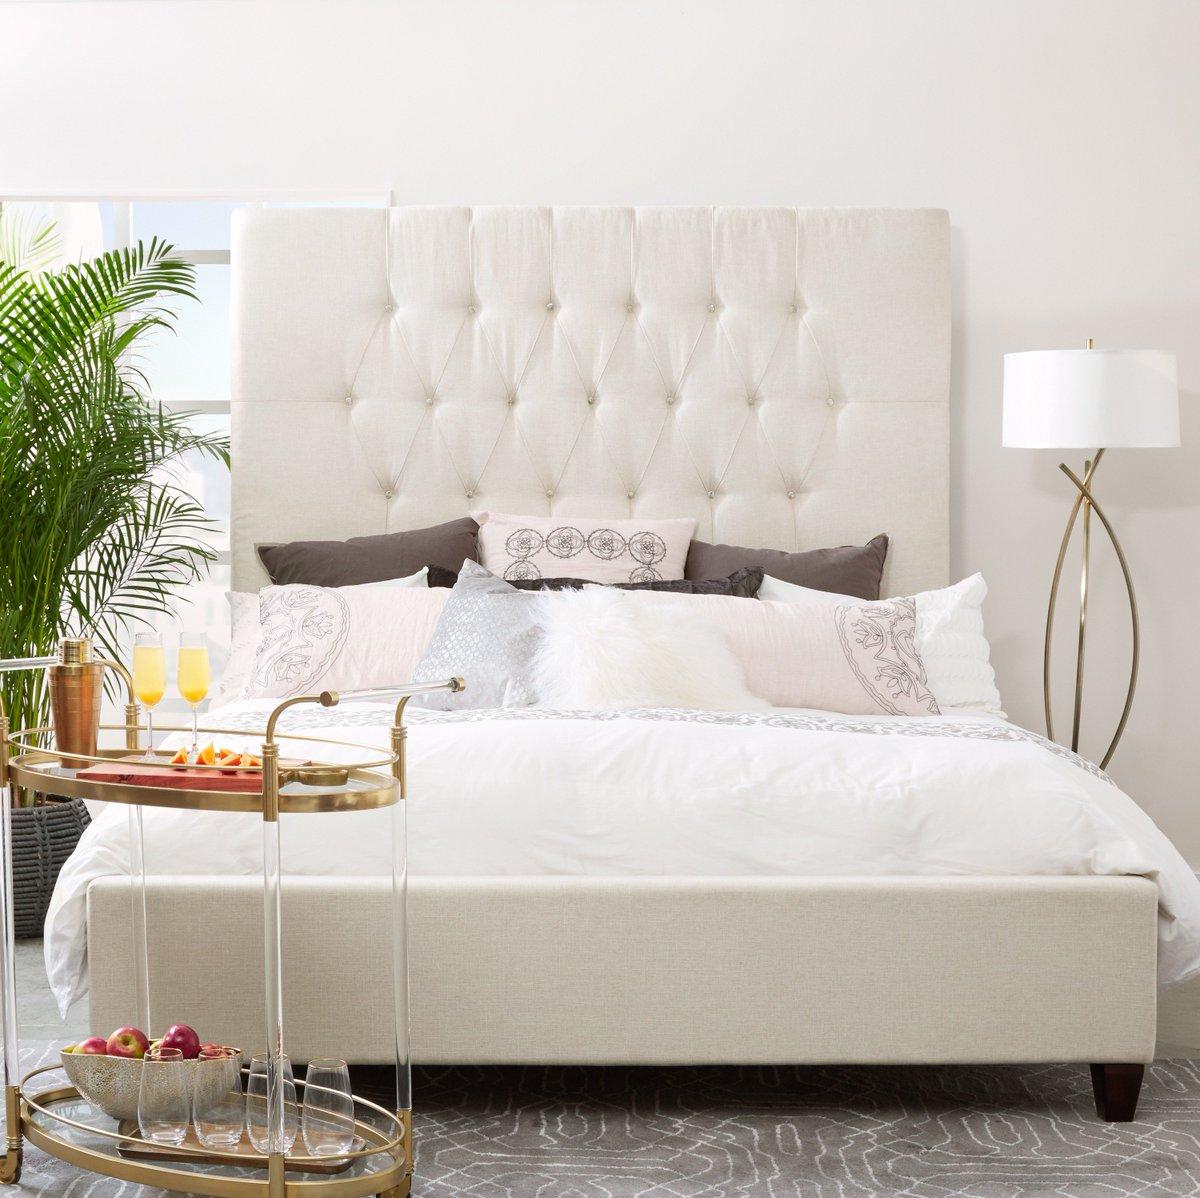 #MondayFeelings Http://www.eldoradofurniture.com/chic Ii King Platform Bed.html  U2026pic.twitter.com/3y8GKTyYhE